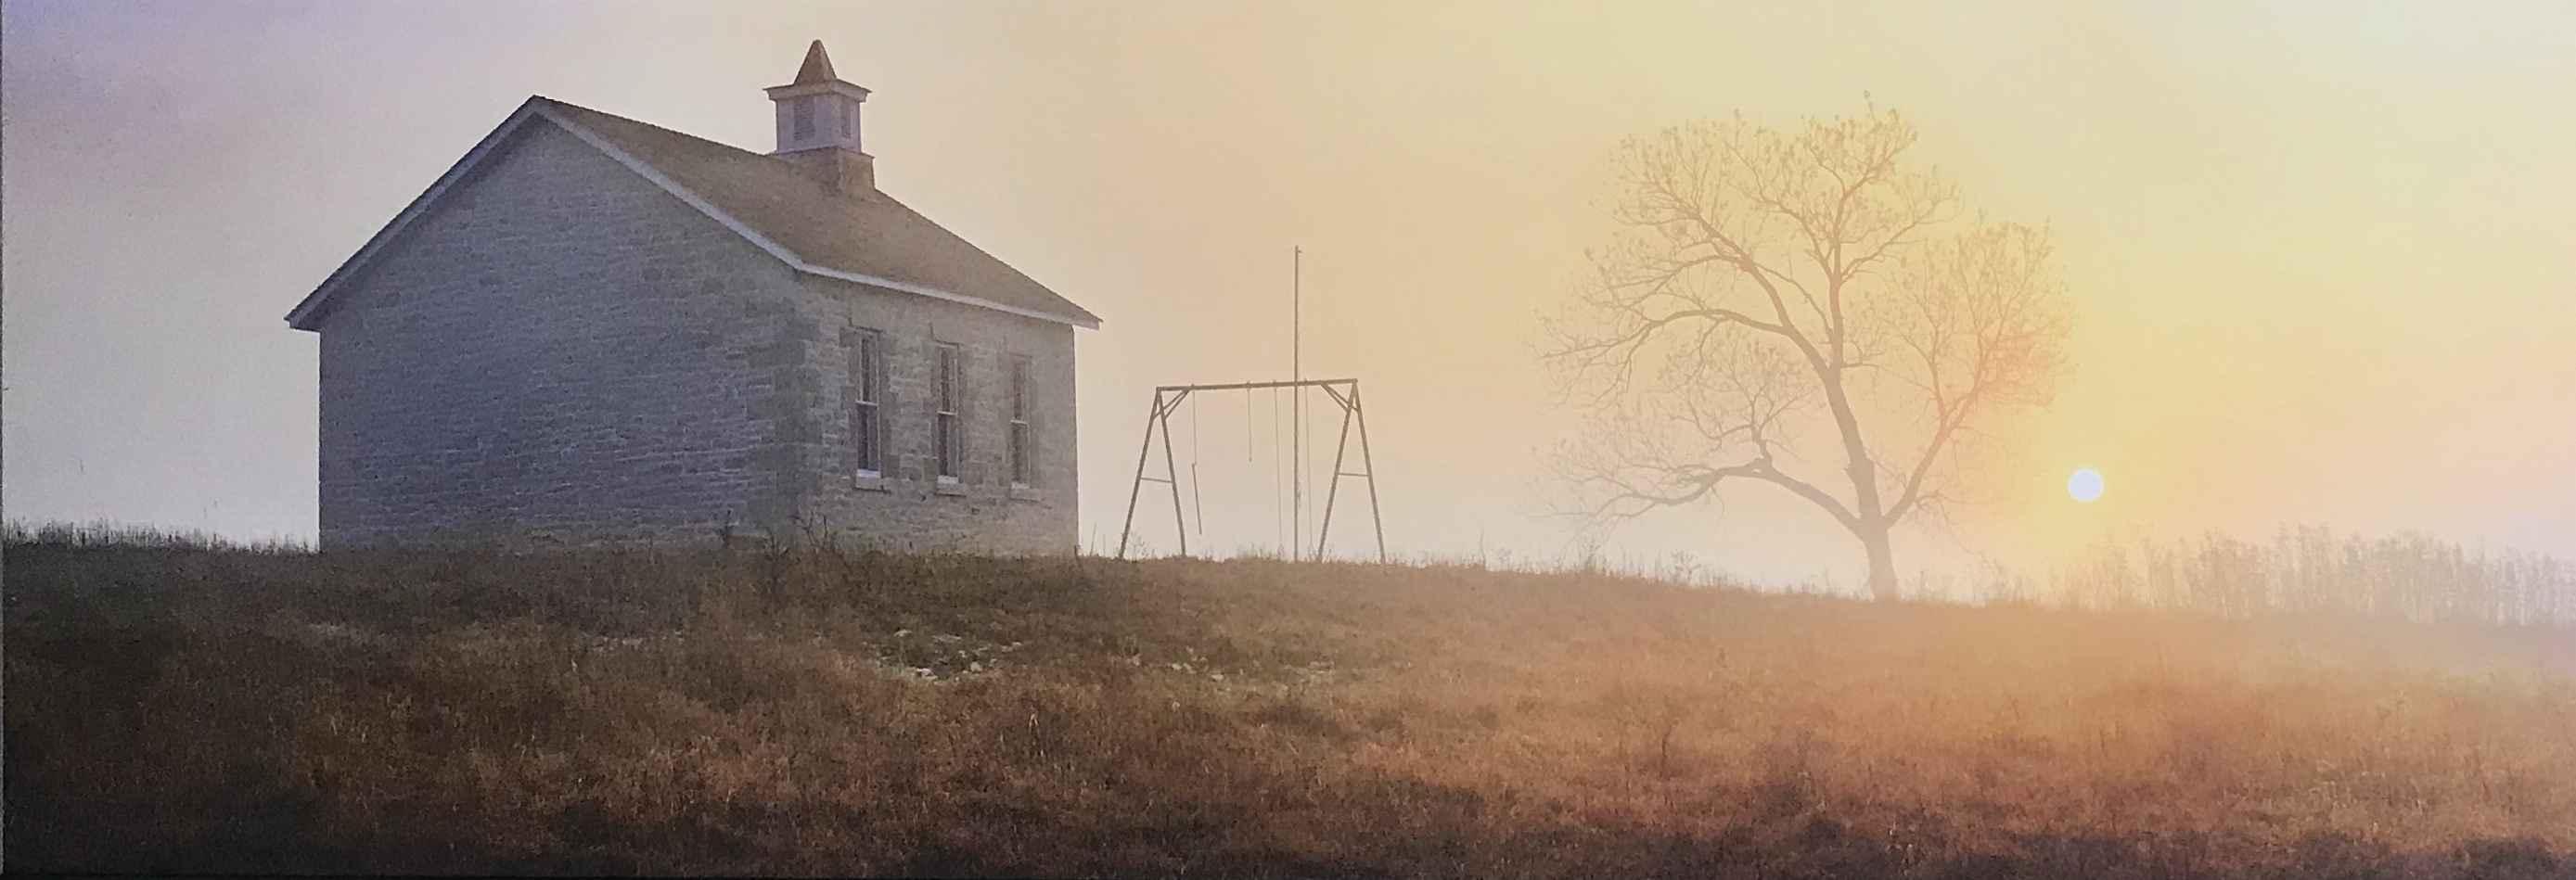 Schoolhouse Sunset by  George Jerkovich - Masterpiece Online